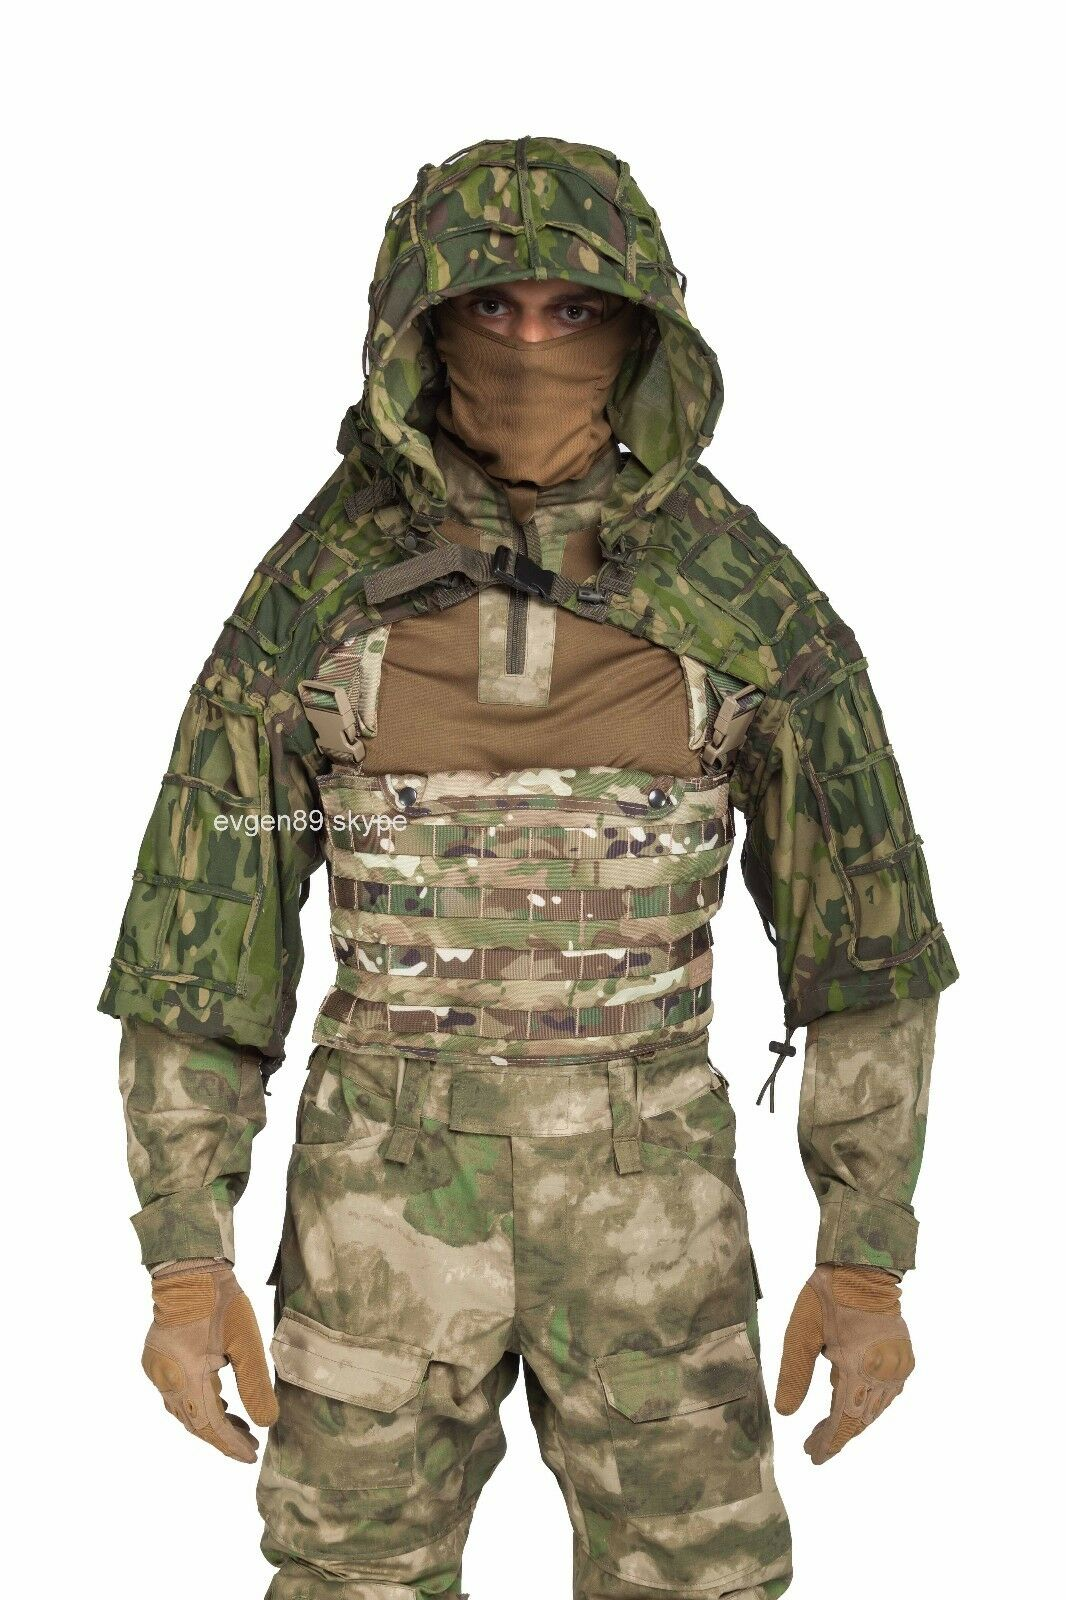 Disguise Sniper  Coat   Viper Hood Russian Spetsnaz Multicam Tropic  100% genuine counter guarantee